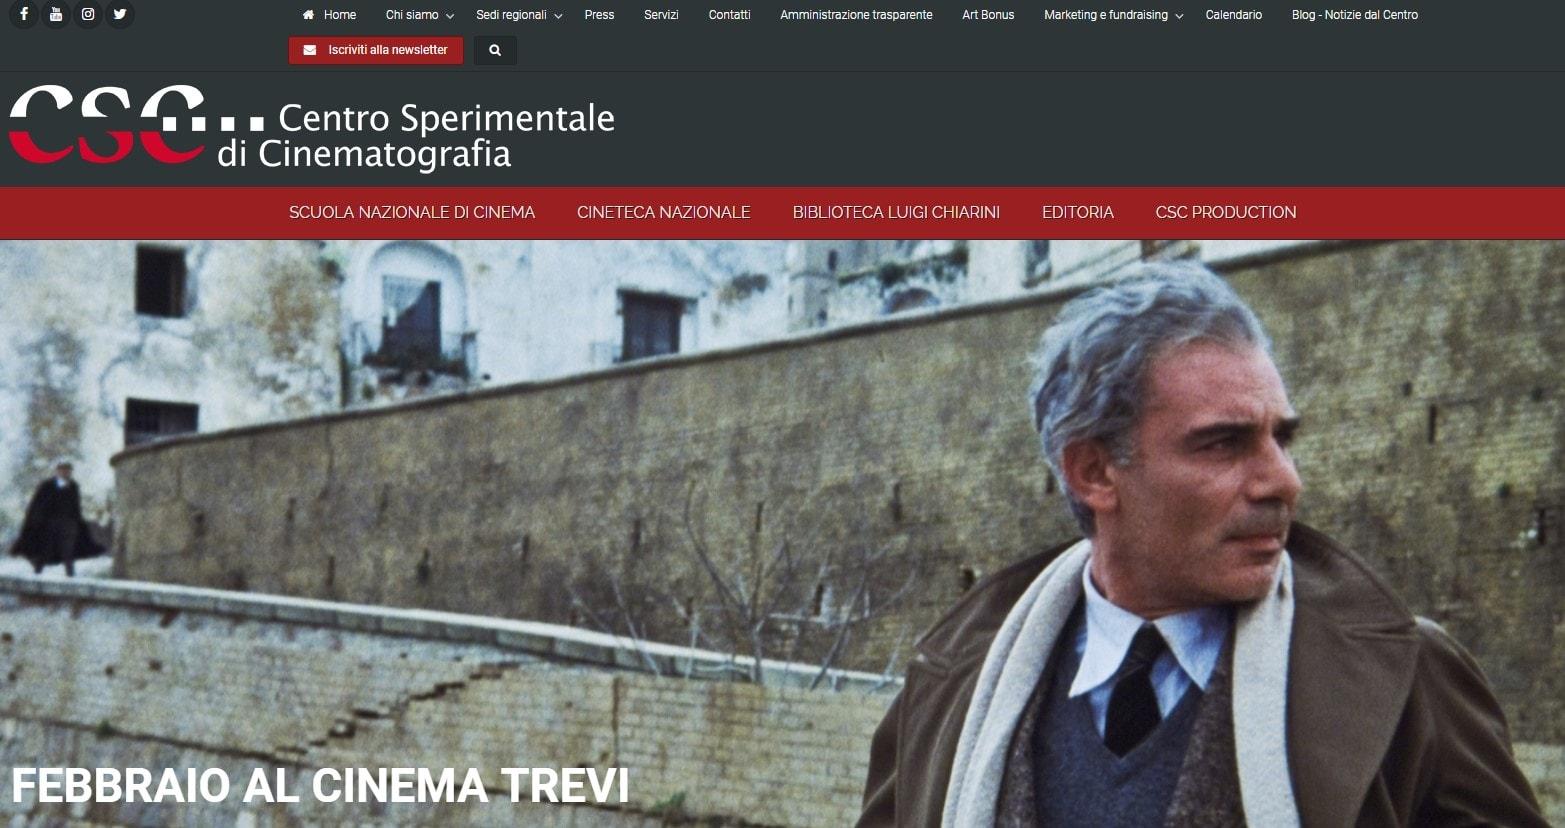 Italian National Film School